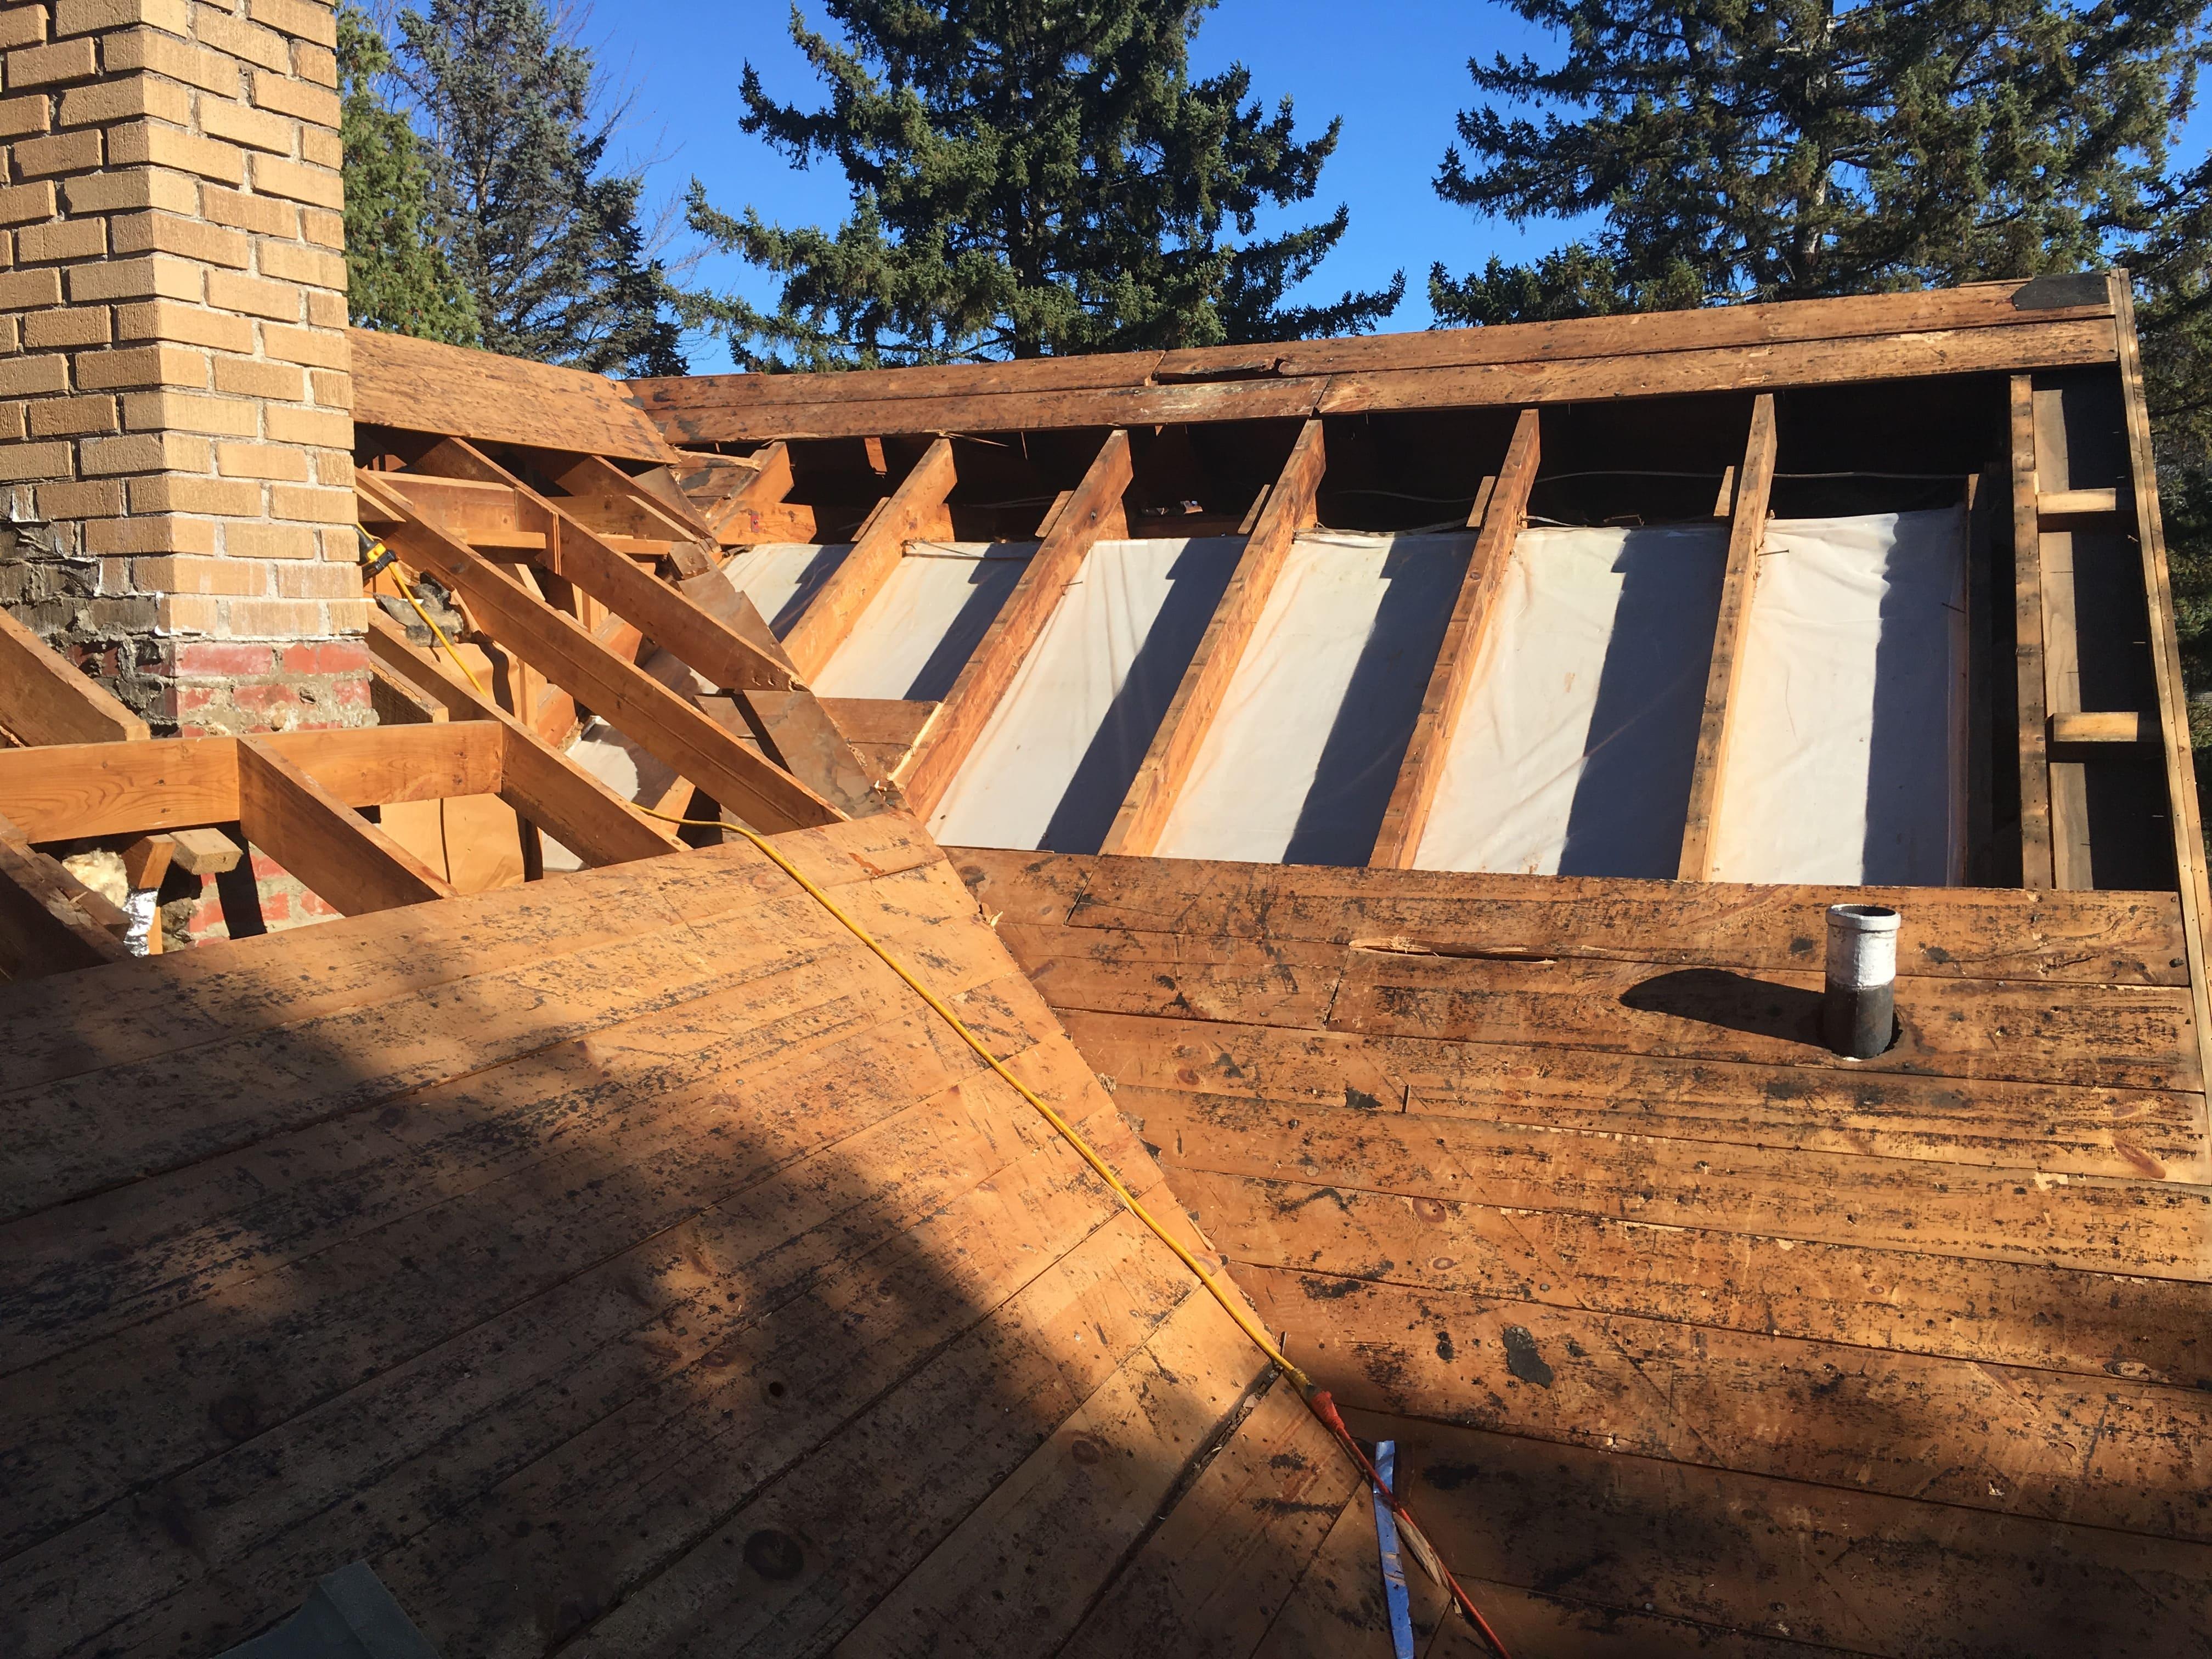 cape-cod-roof-spray-foam-1